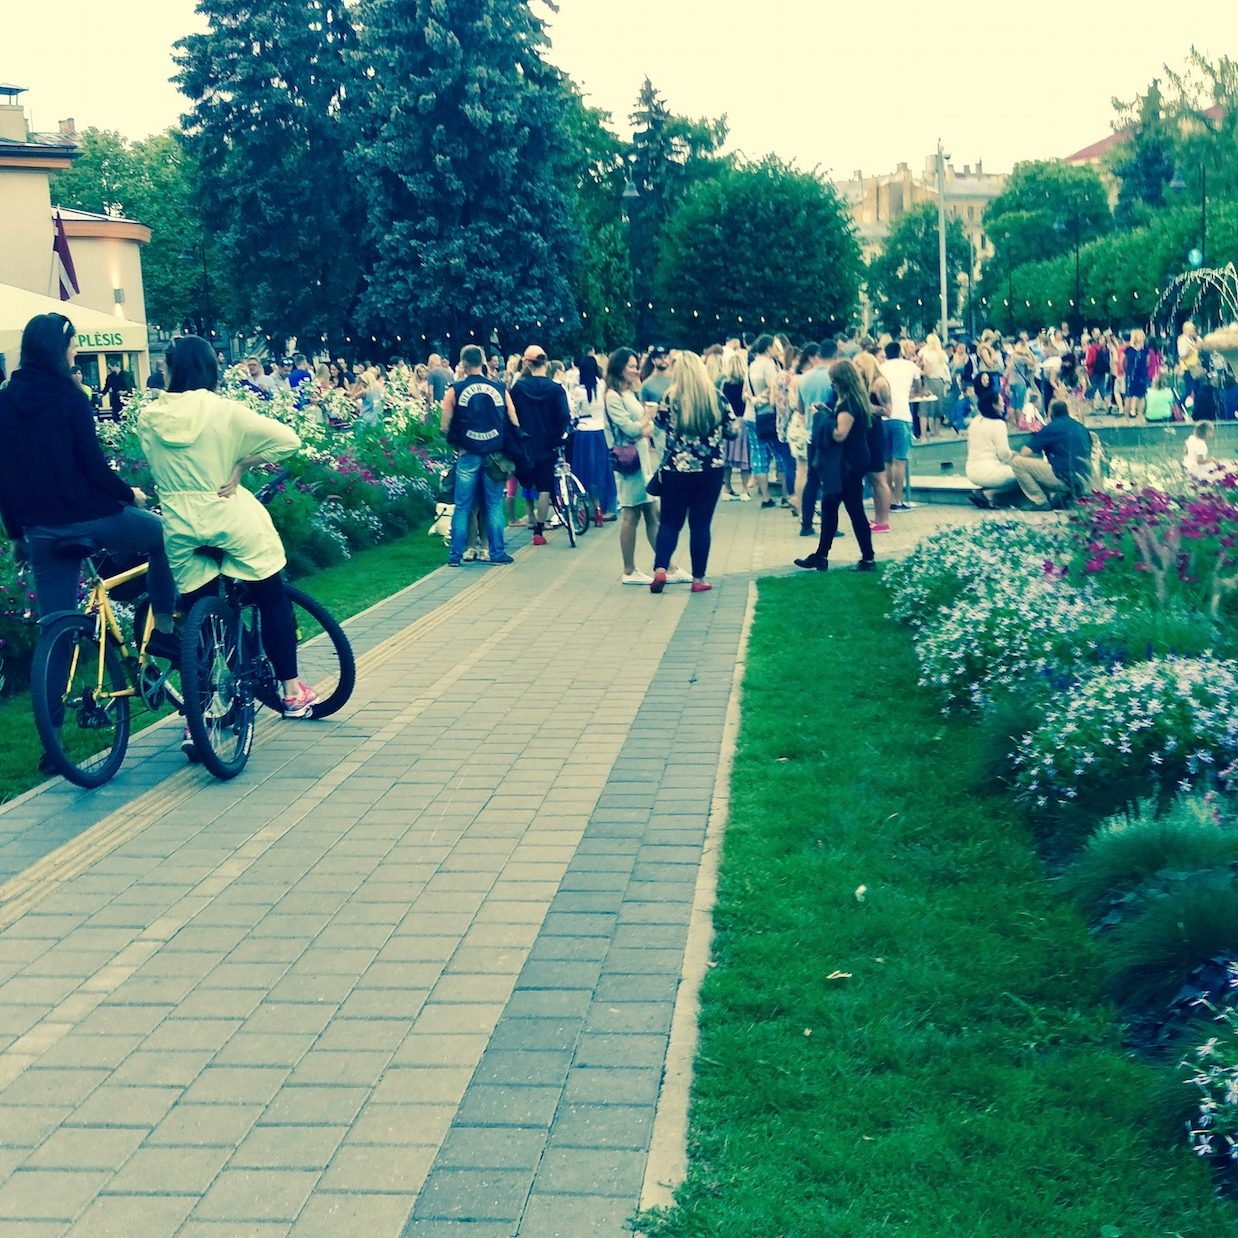 avoti-neighborhood-biking-path